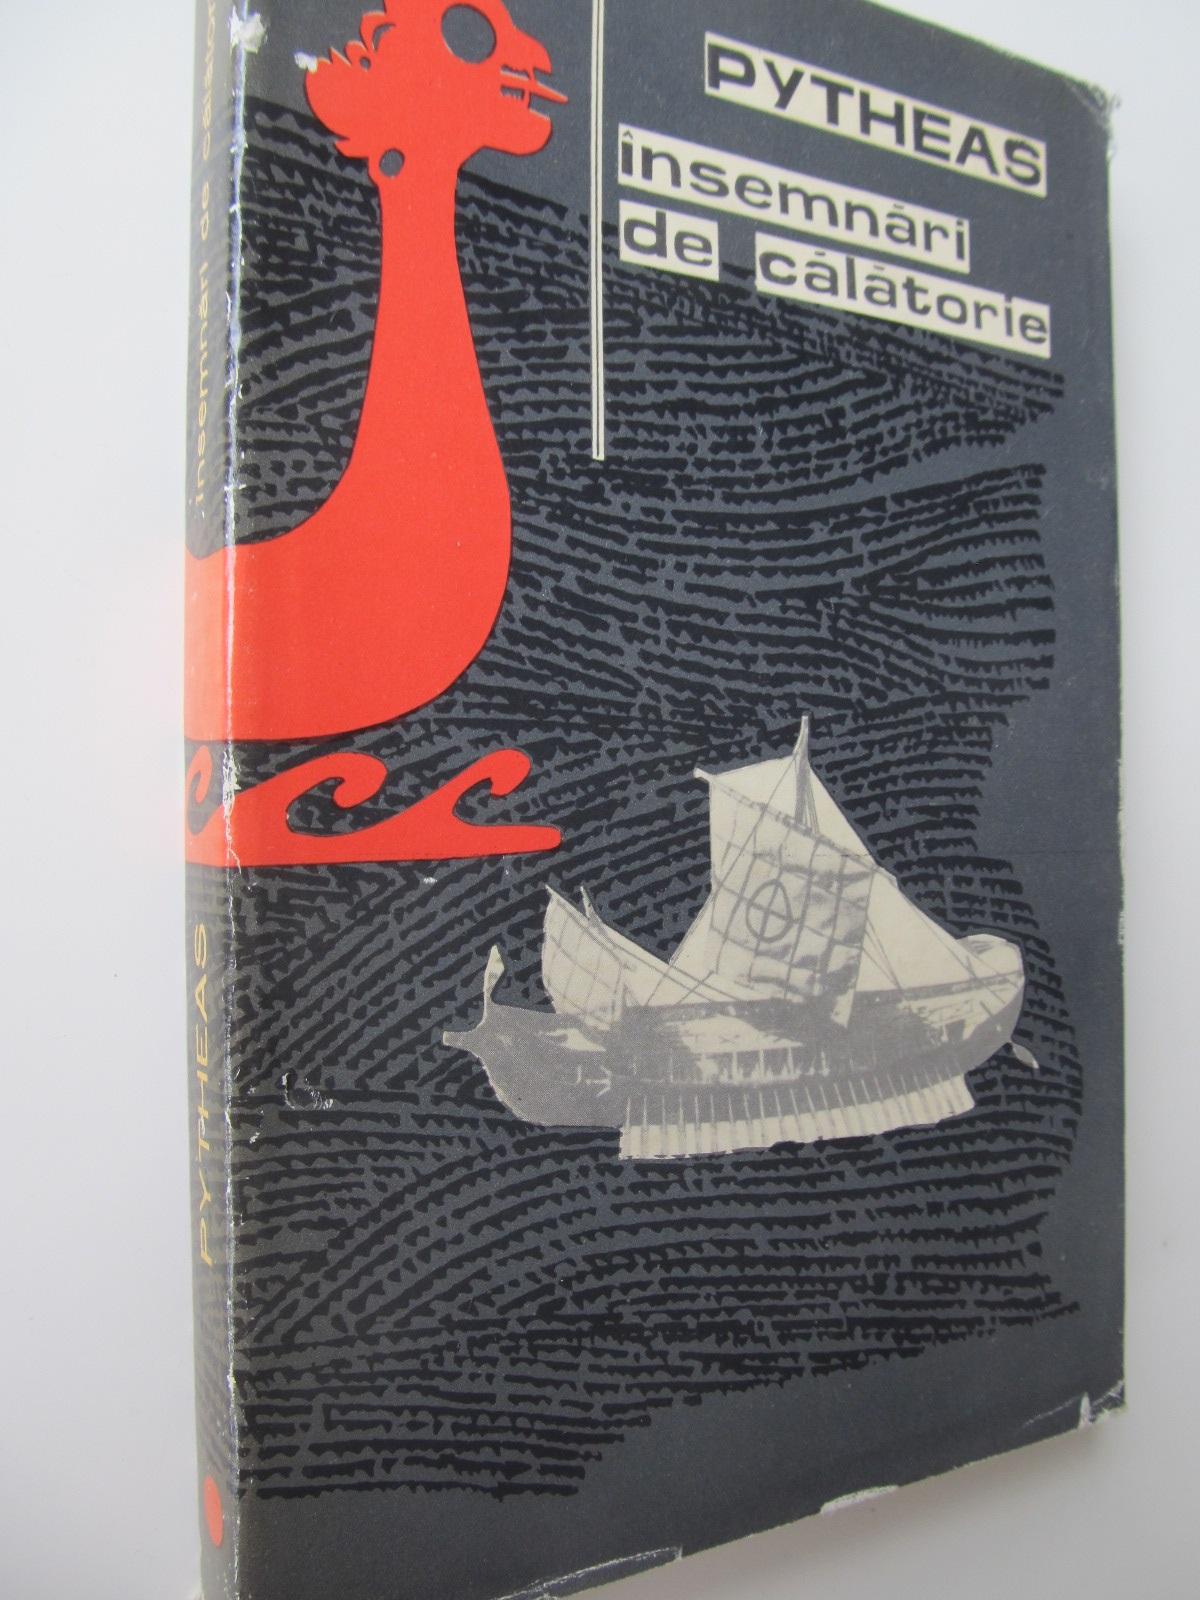 Pytheas - Insemnari de calatorie - comentat de Ferdinand Lallemand | Detalii carte